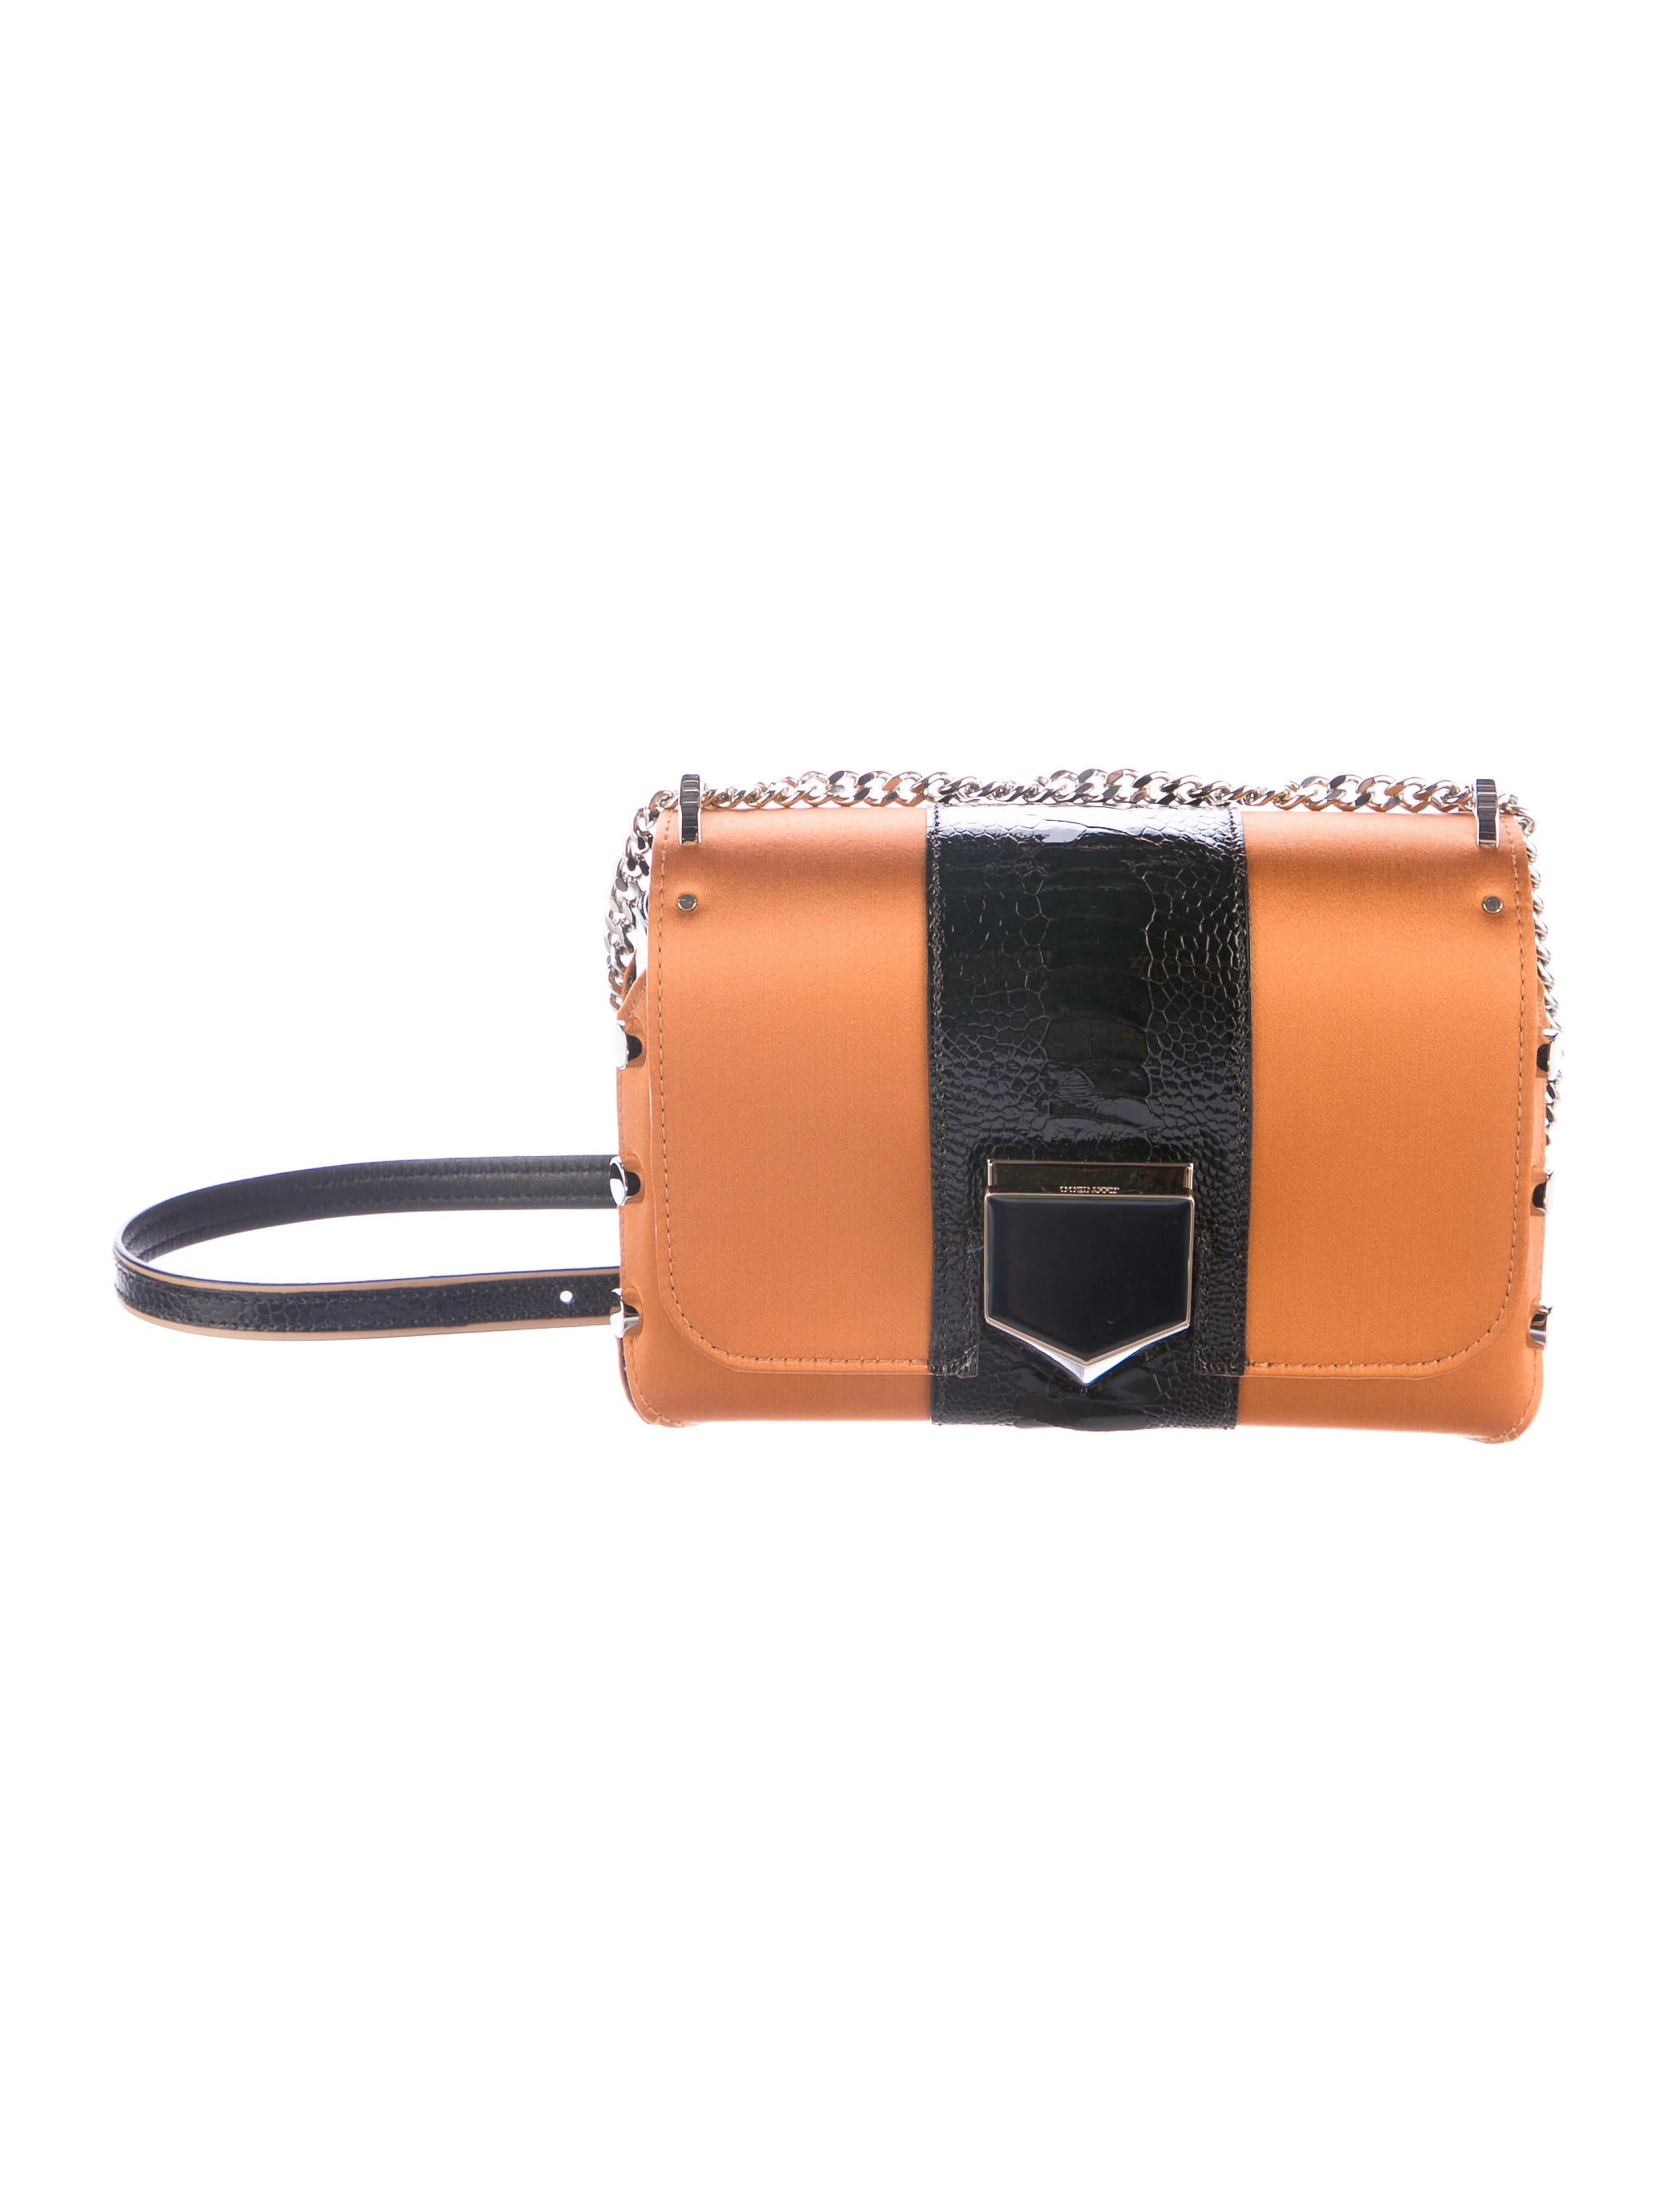 60b3f15a2e Jimmy Choo Satin & Ostrich Leg Petite Lockett Bag - Handbags ...